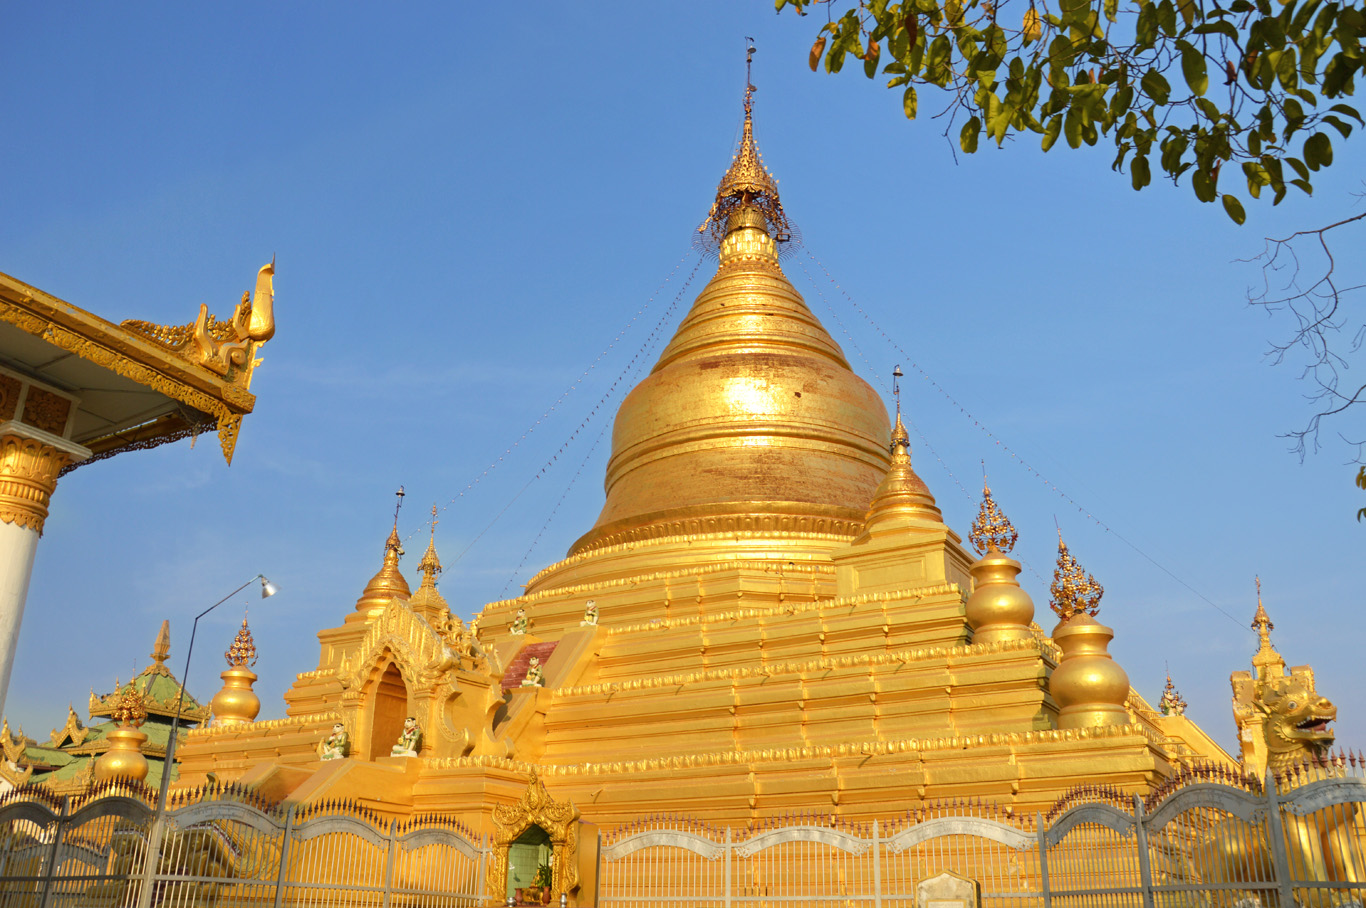 The main stupa in Kuthodaw Pagoda